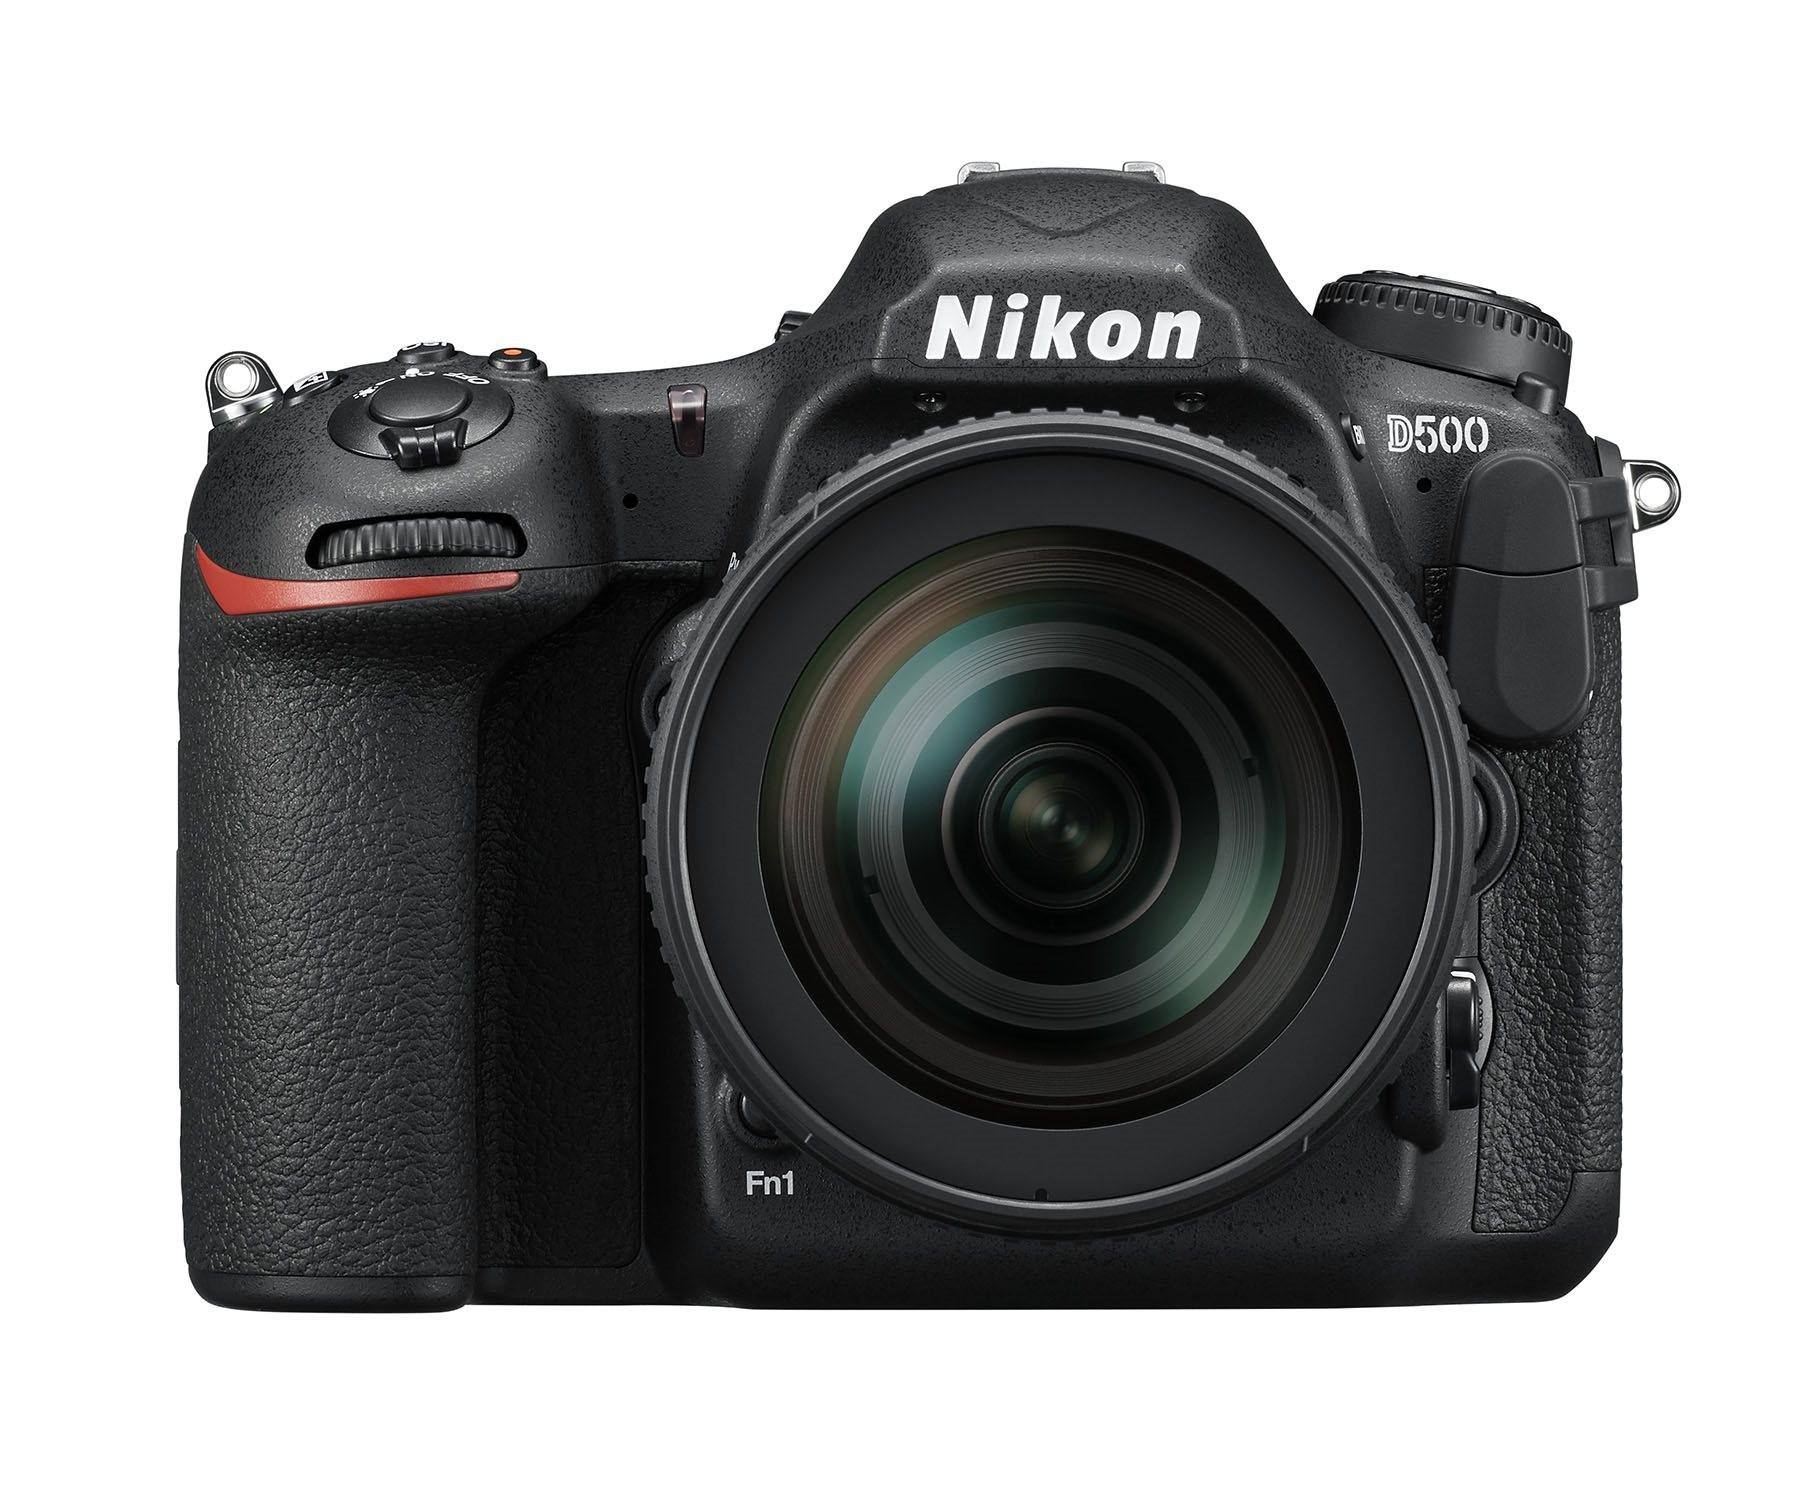 Fotocamera Digitale Reflex Nikon D500 Kit + 16-80mm Nikon VR